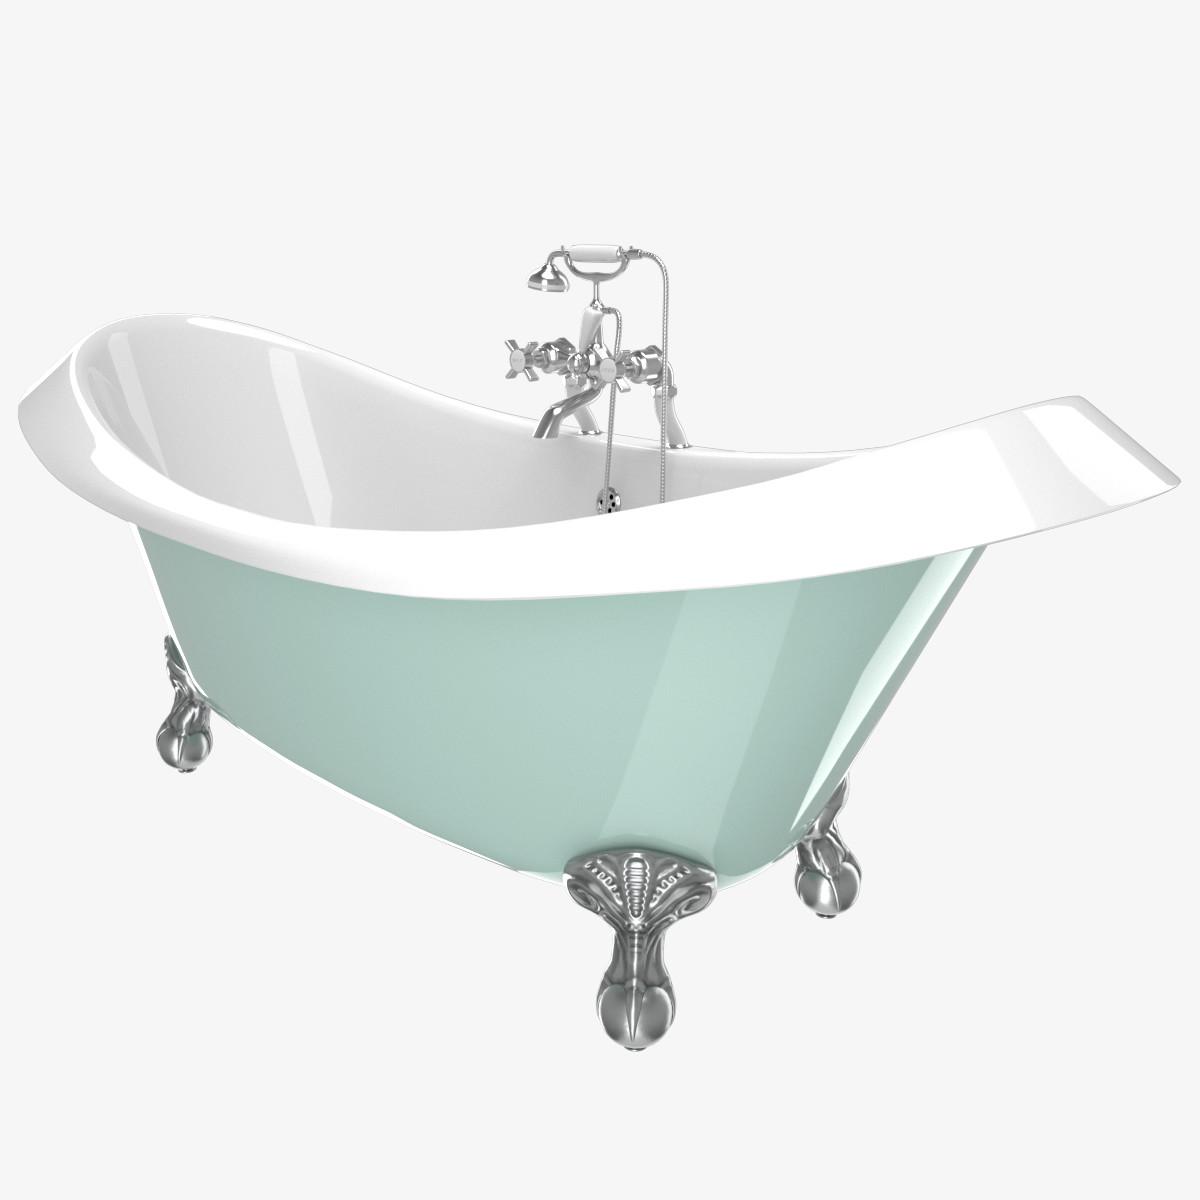 Fine Paint Bathtub Tall Paint For Bathtub Shaped Bath Tub Paint Paint A Bathtub Youthful Paint For Tubs Pink Can You Paint A Tub